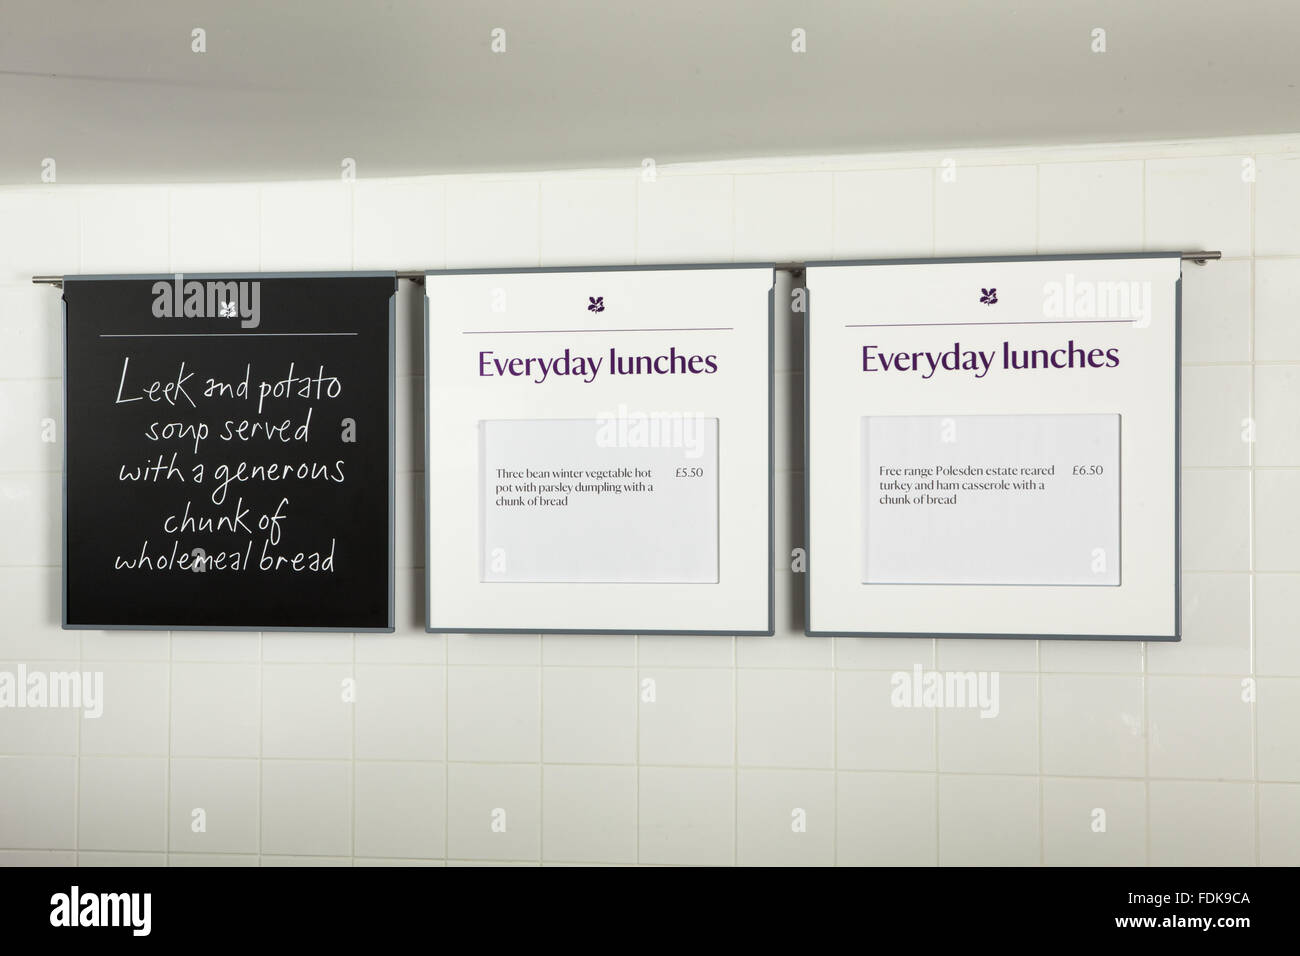 Lunch menus at Polesden Lacey restaurant, Surrey. - Stock Image